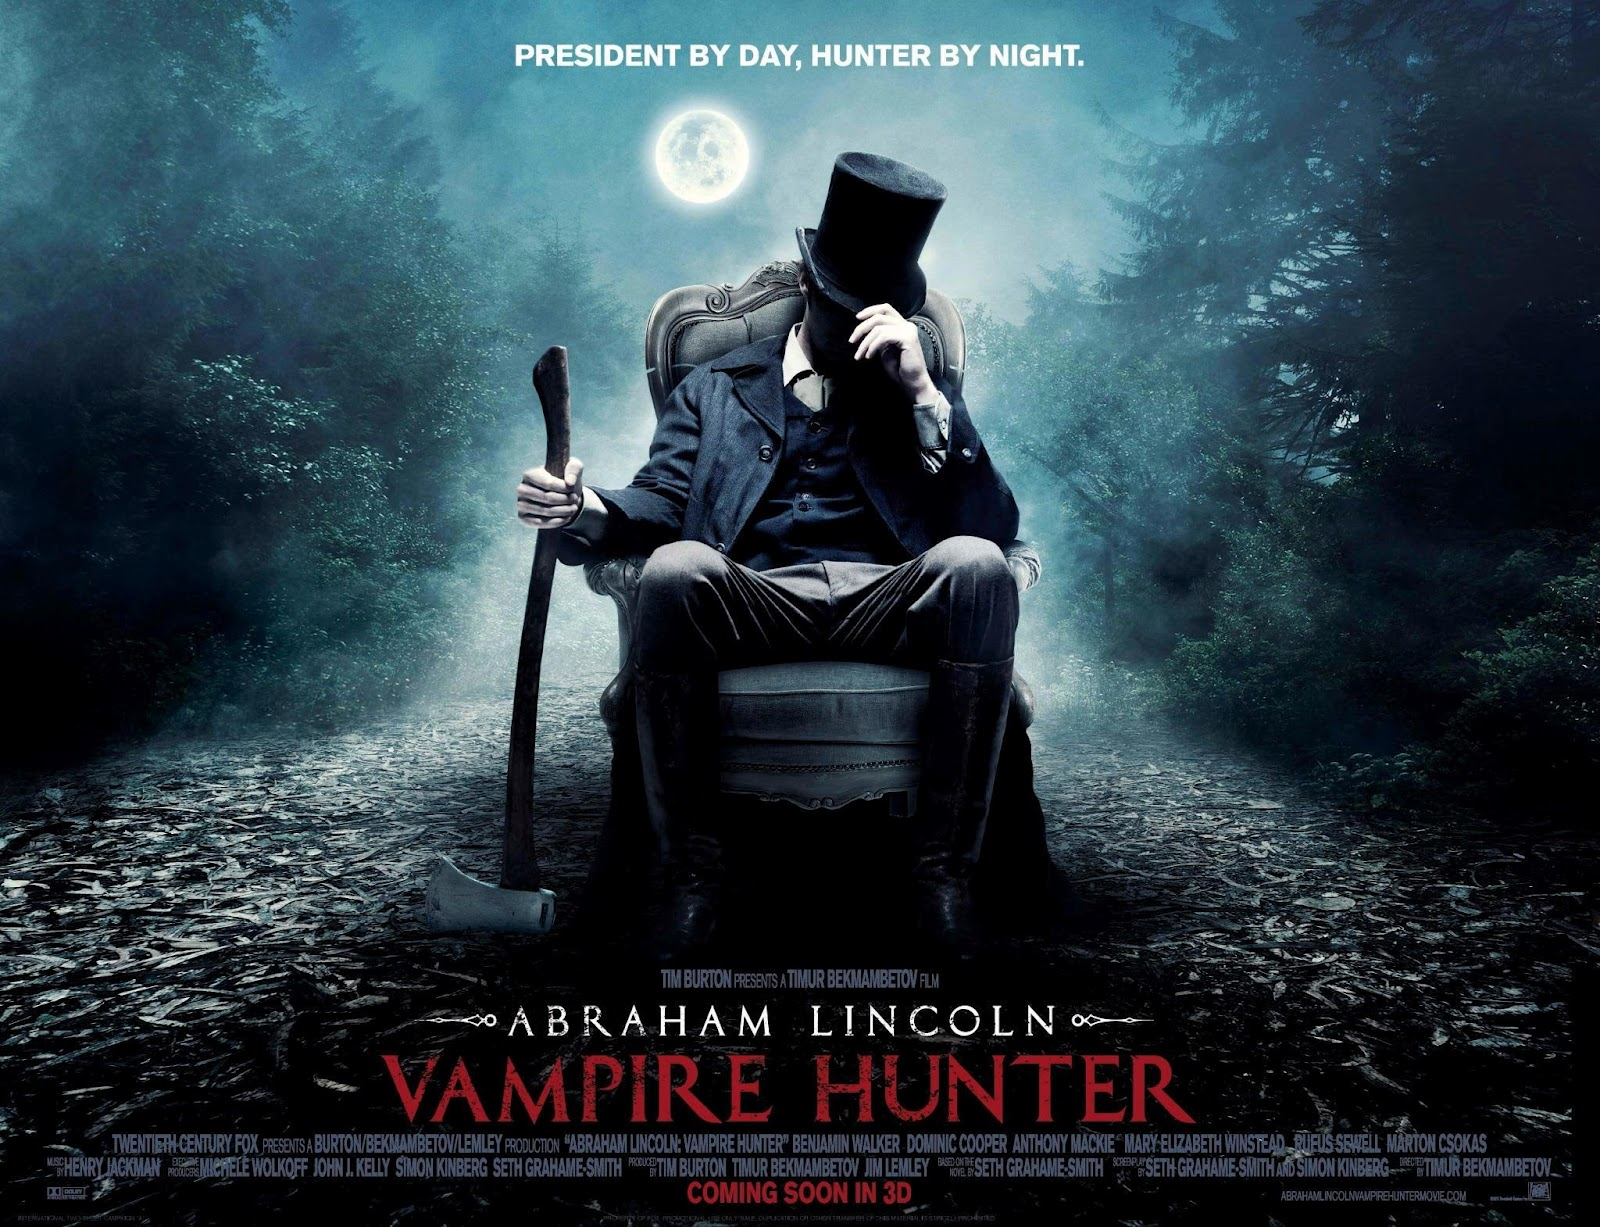 http://1.bp.blogspot.com/-MDTNWa2Jc2Q/T8FI8UmLMrI/AAAAAAAACas/8xhsPicsJGc/s1600/Abraham-Lincoln-Vampire-Hunter6.jpg